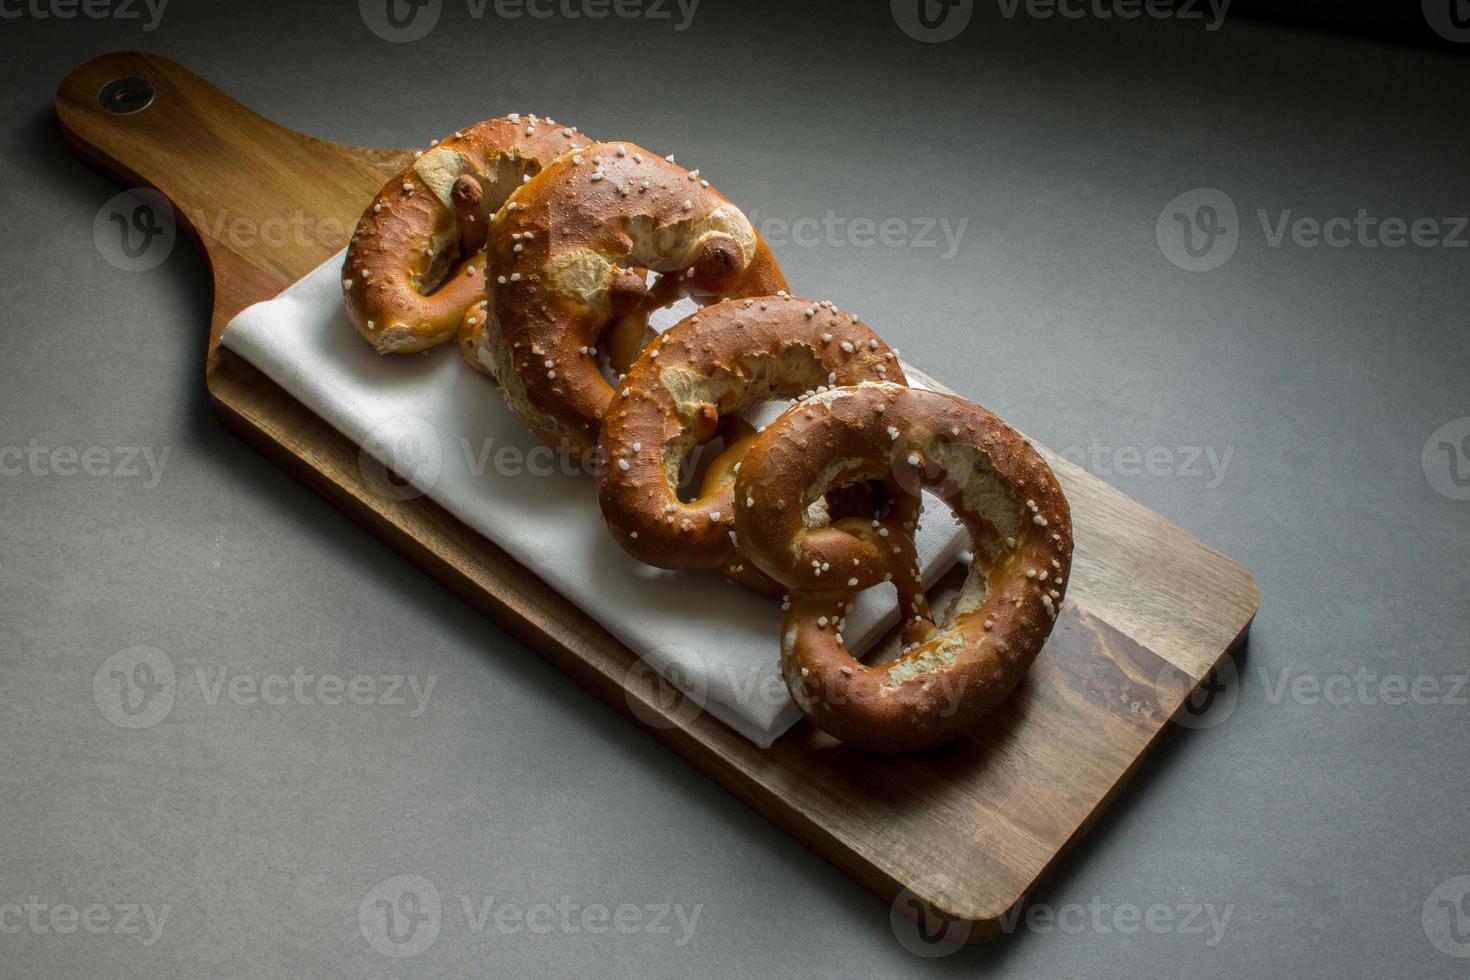 breze / brezn / pretzels em uma tábua de pão foto